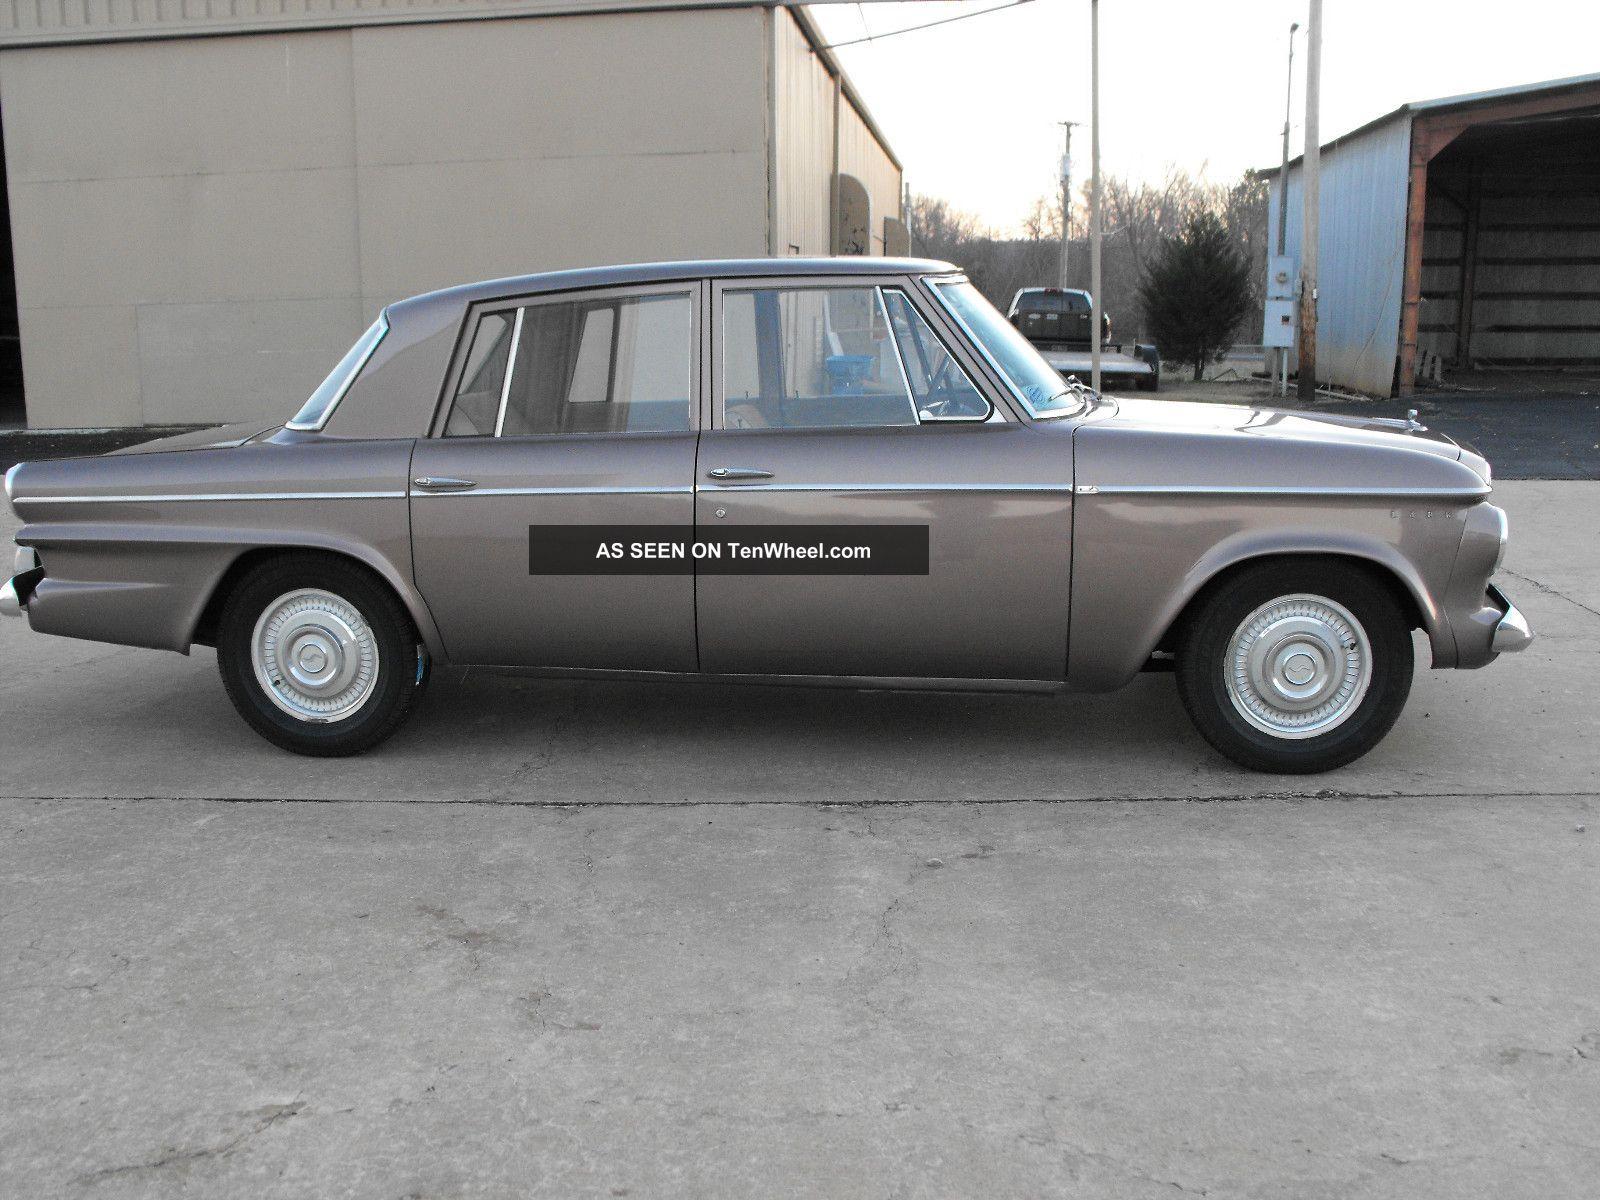 Studebaker Lark Drive Anywhere Lgw on 500 Ci Cadillac Engine Specs